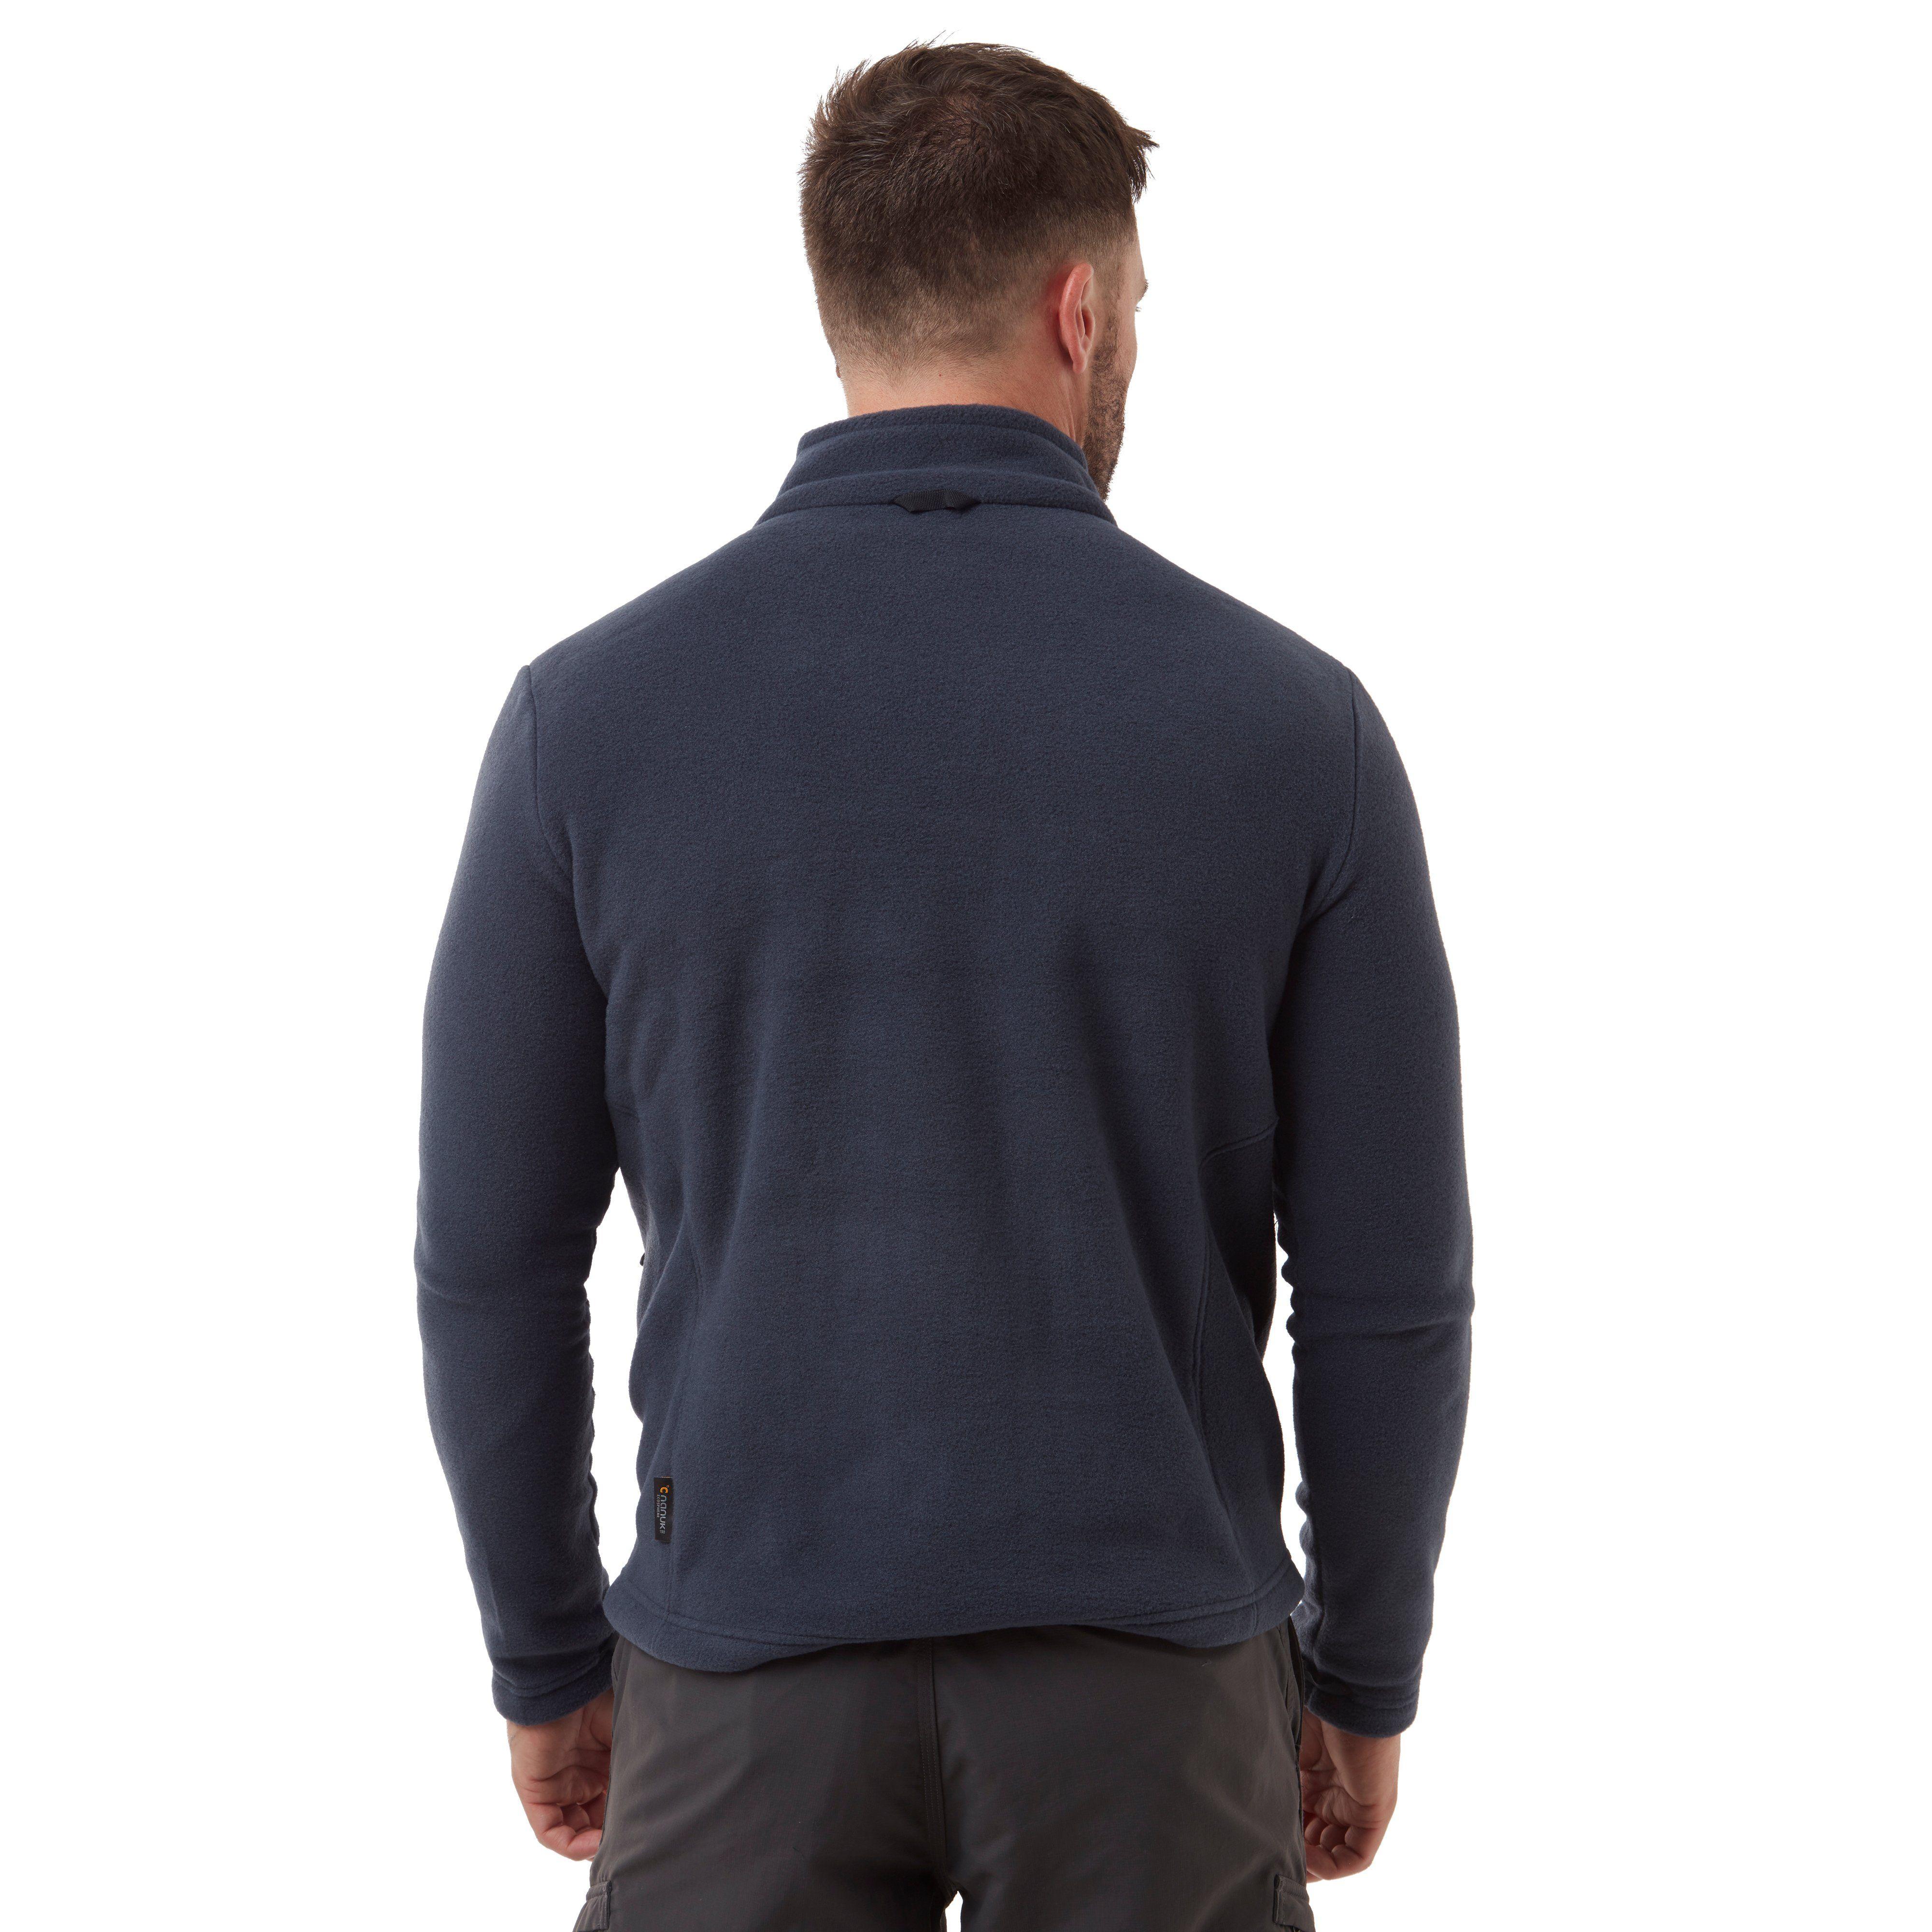 Jack Wolfskin Moonrise Men's Jacket